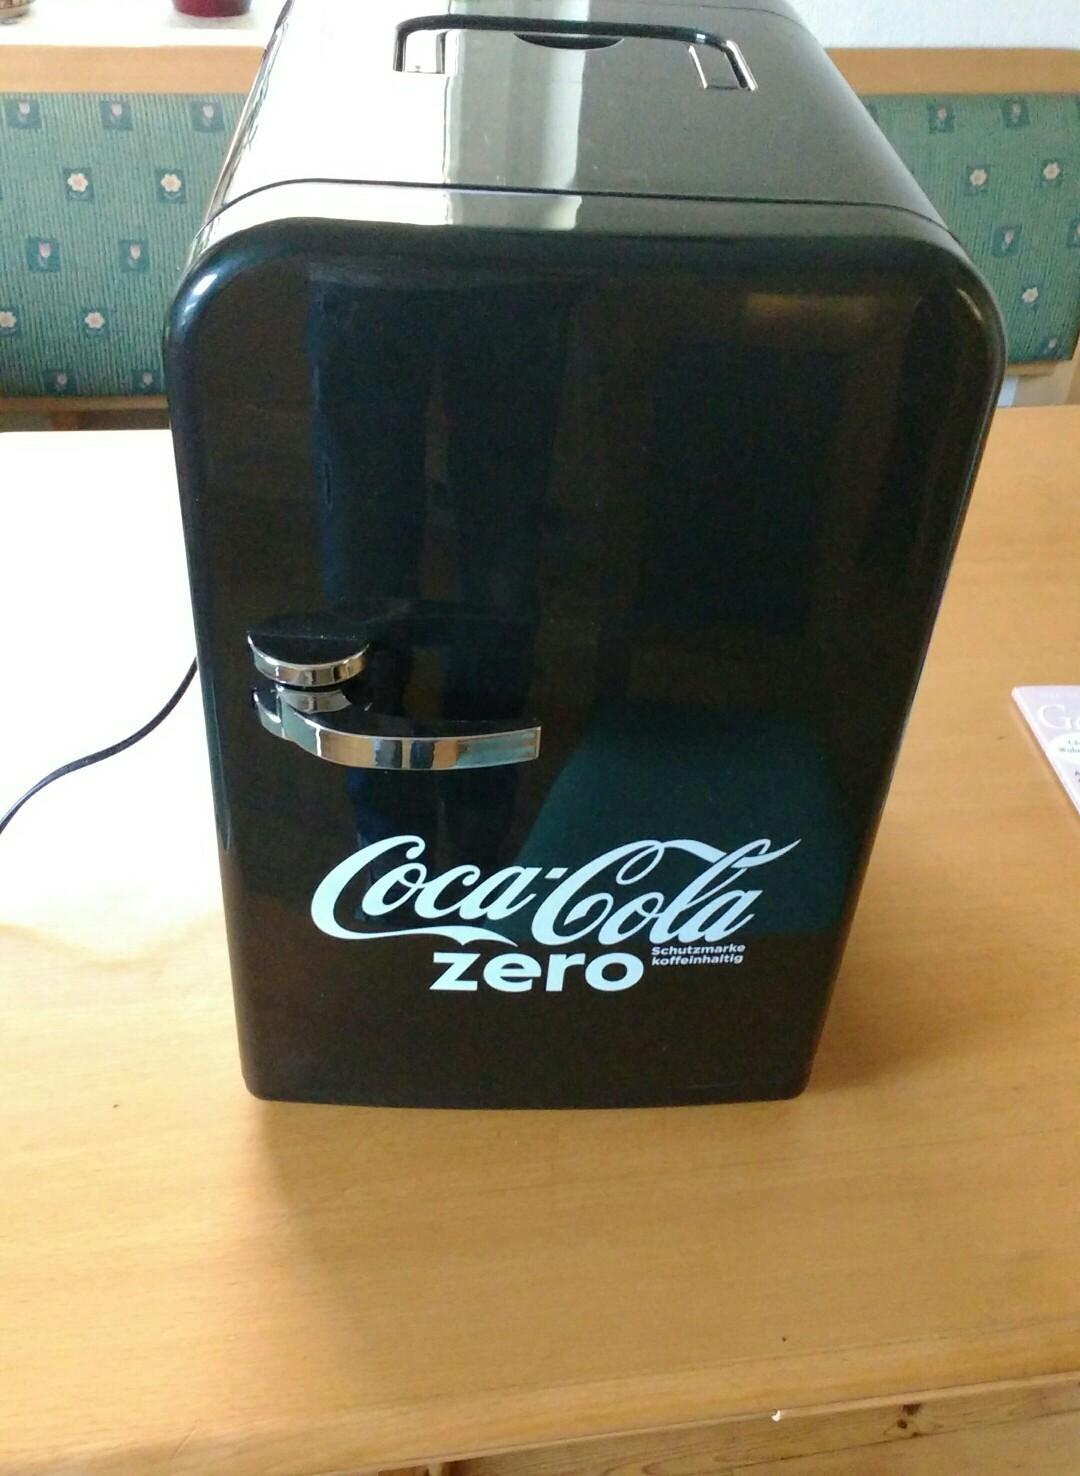 Minibar Kühlschrank Coca Cola : Gebraucht coca cola zero kühlschrank minibar vb in